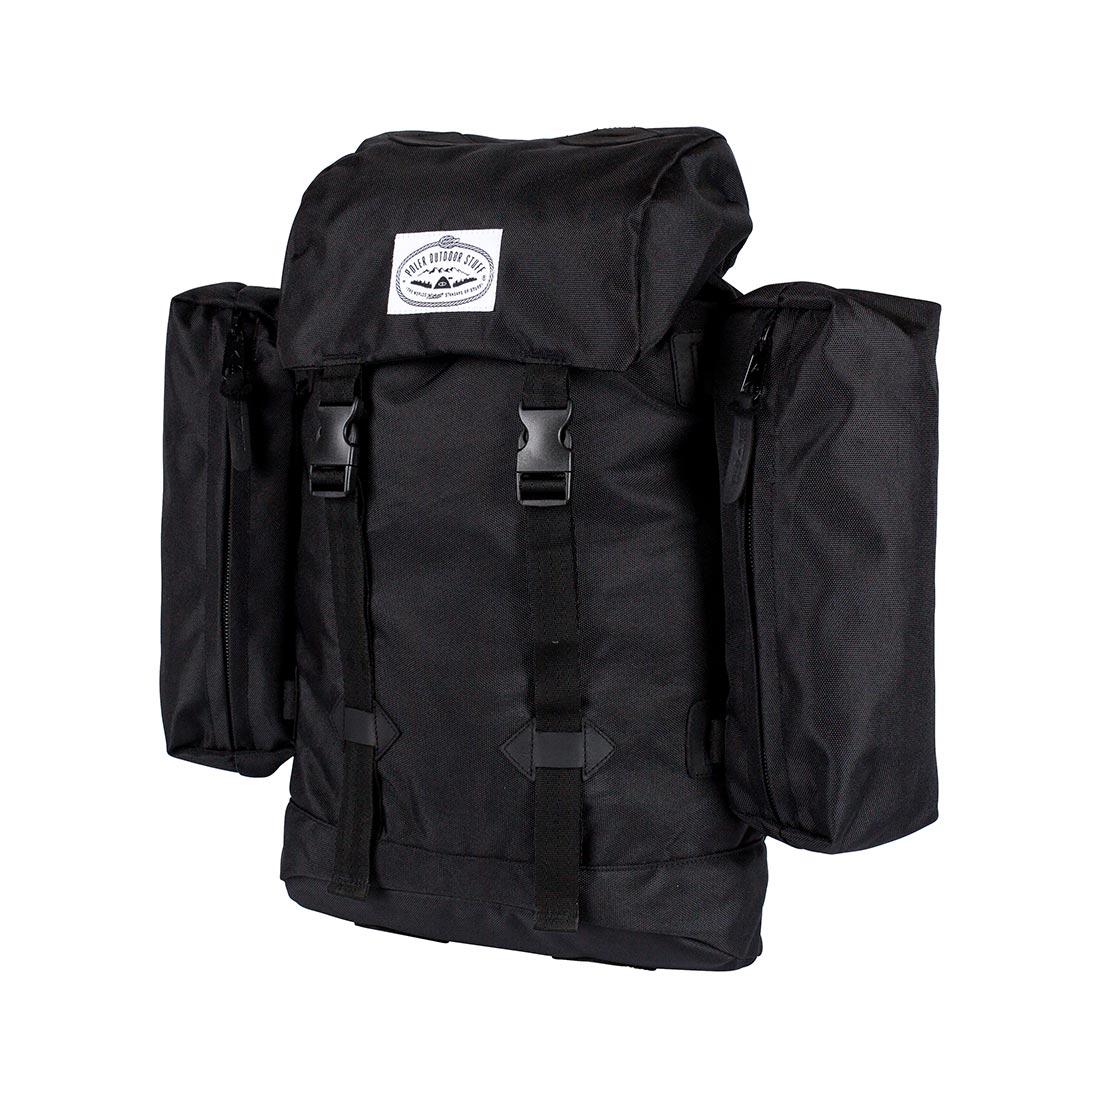 fcd08e25a55a1d Poler Stuff Classic Rucksack 35L Backpack - Black